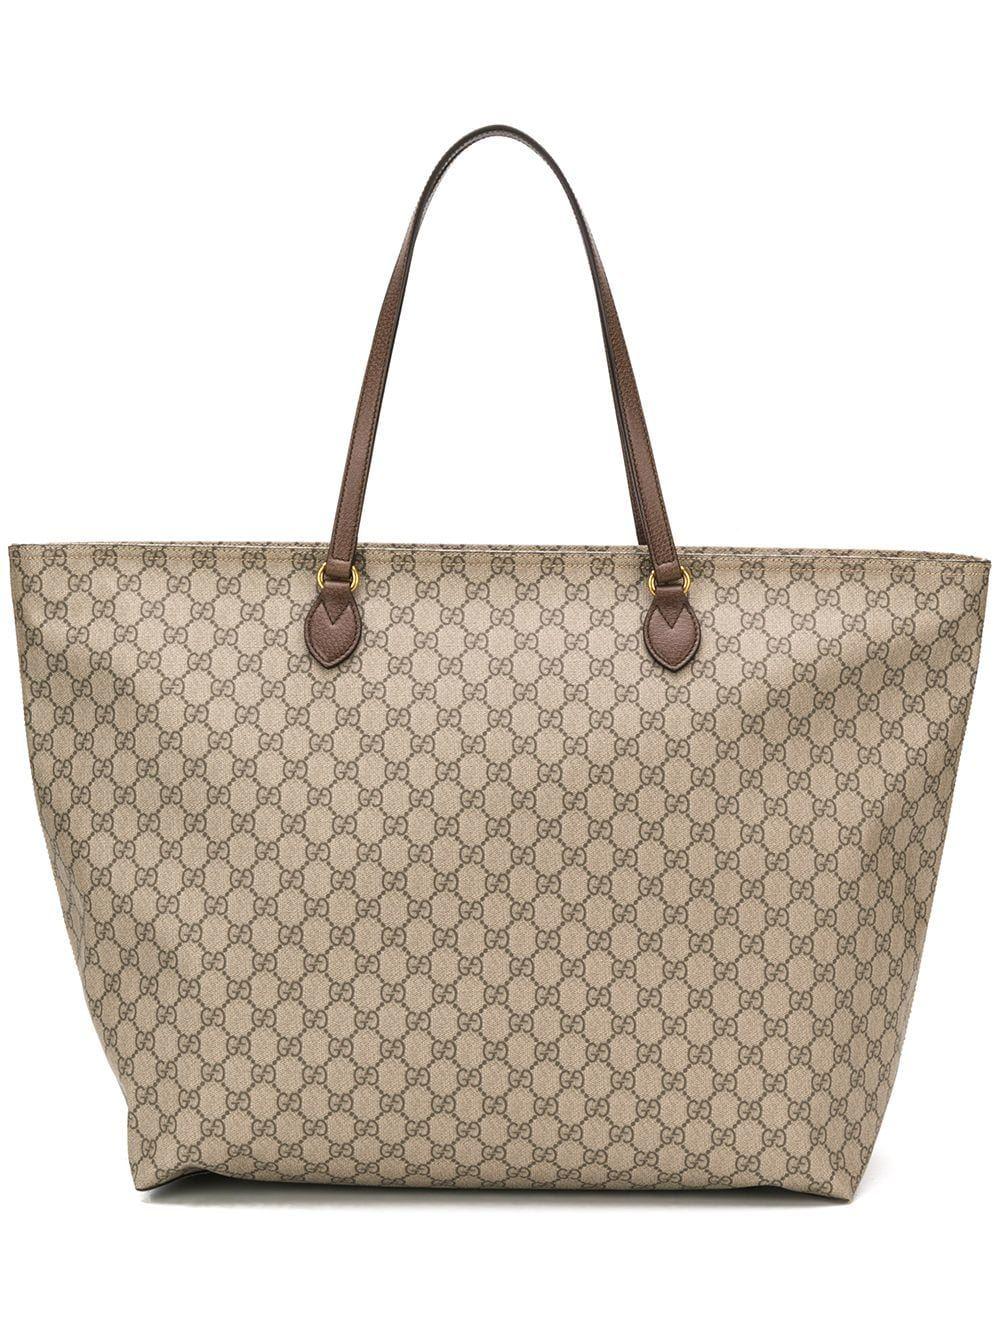 b4d6f710d09 GUCCI GUCCI GG MONOGRAM TOTE BAG - NEUTRALS.  gucci  bags  leather  hand  bags  tote